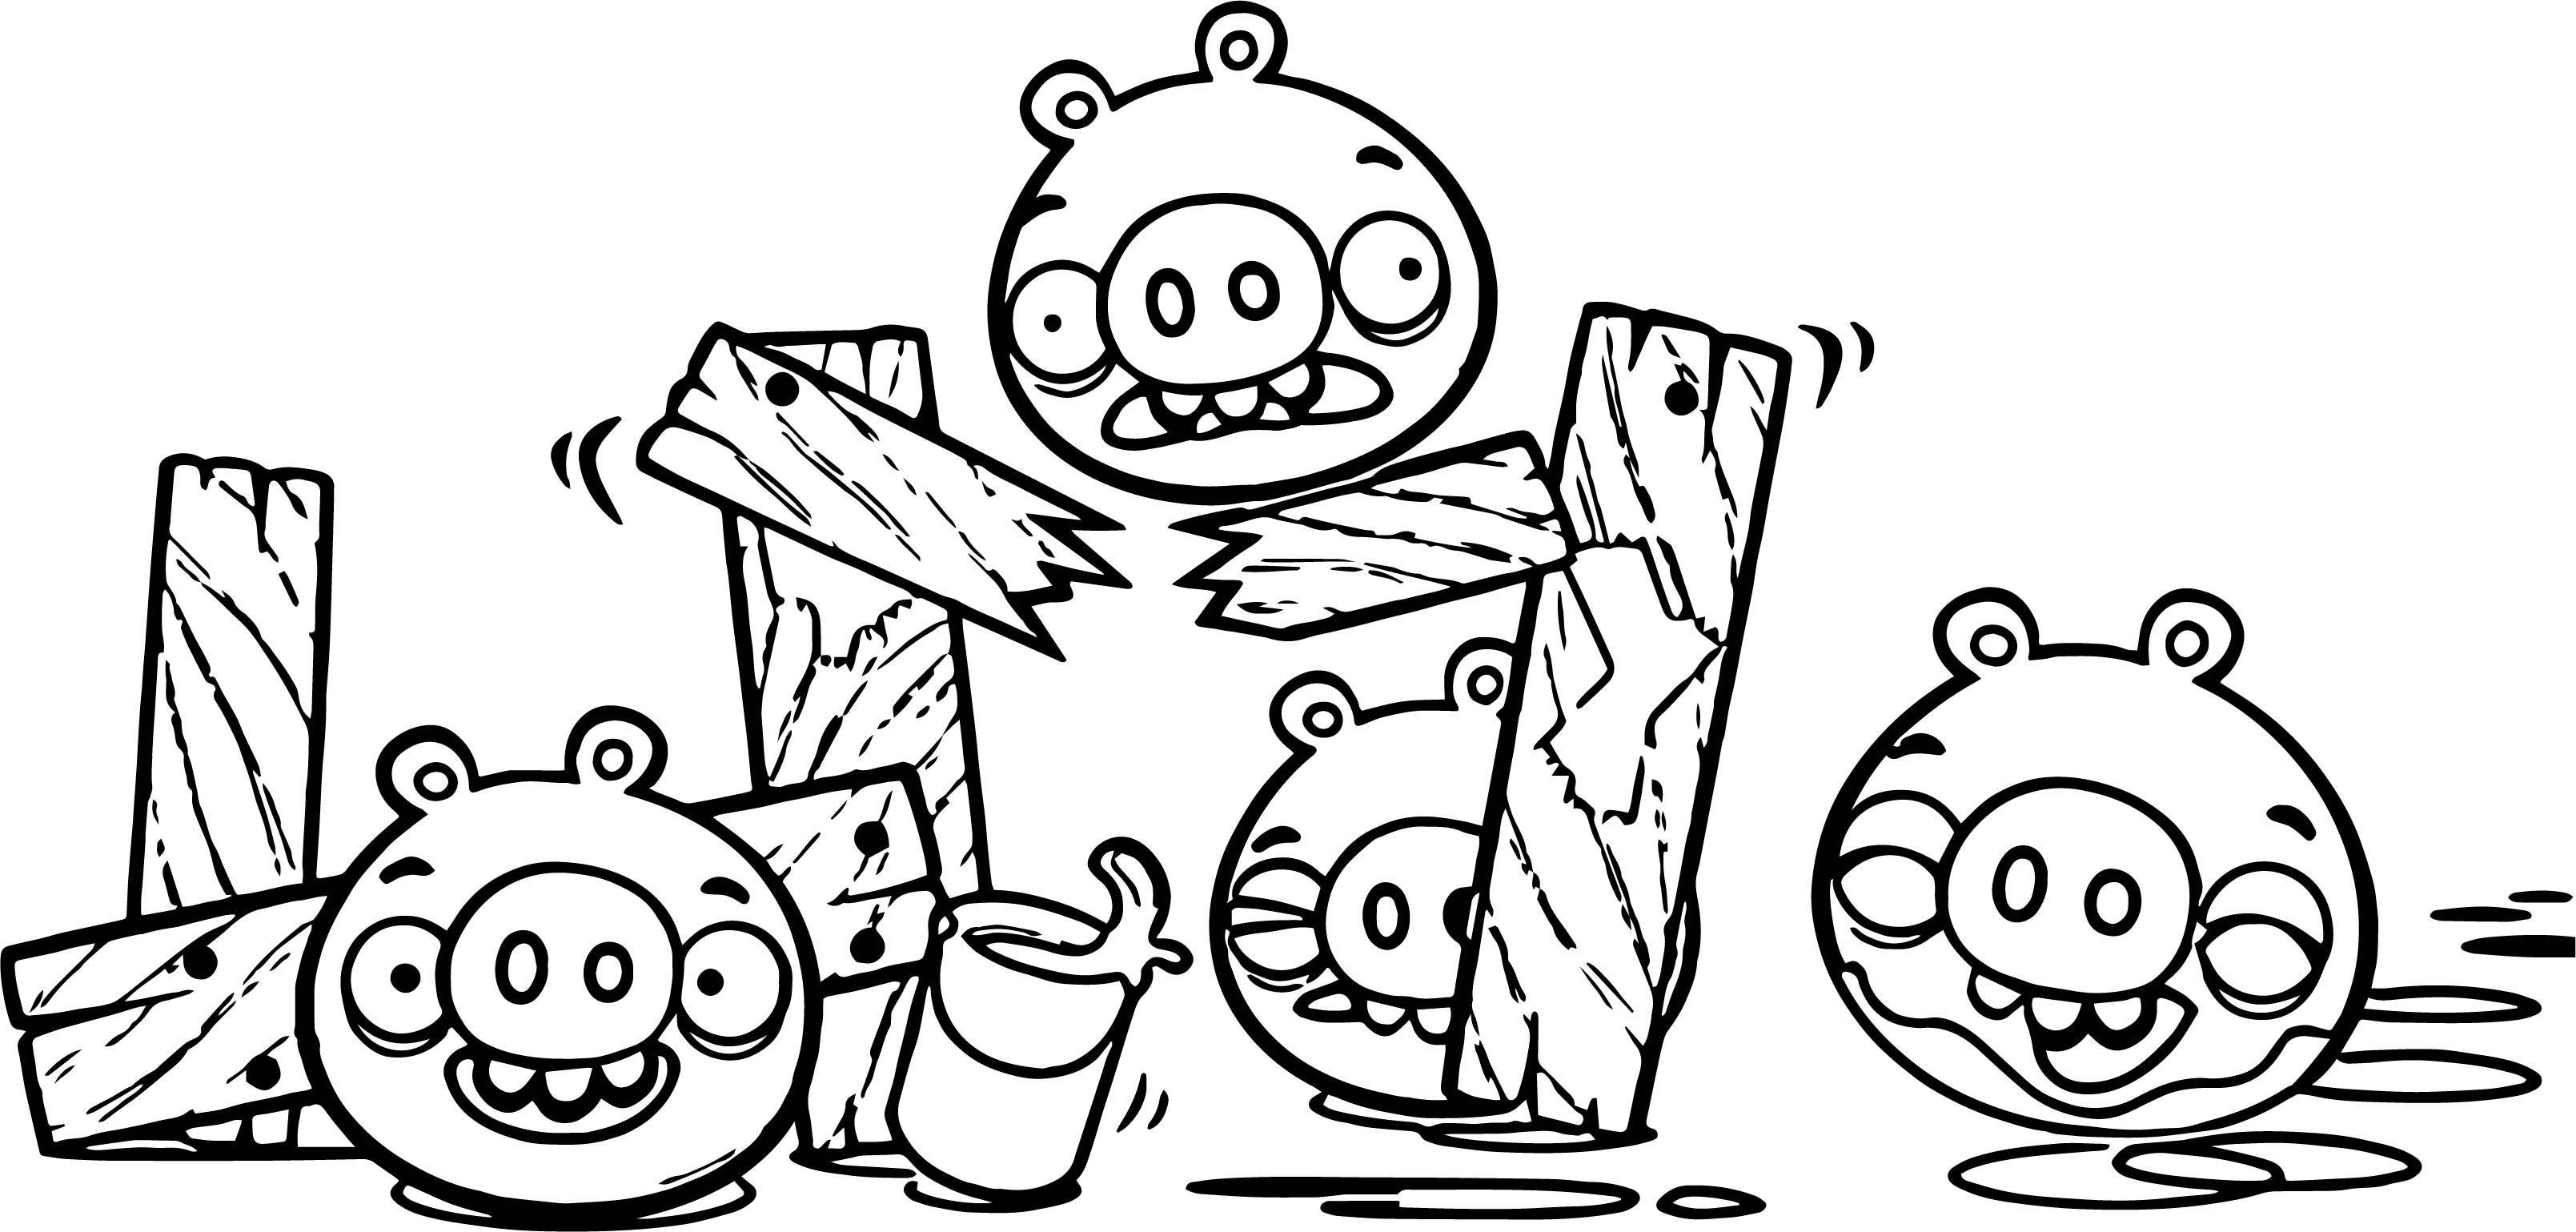 Nice Bad Piggies Coloring Page Bird Coloring Pages Cartoon Coloring Pages Coloring Pages To Print